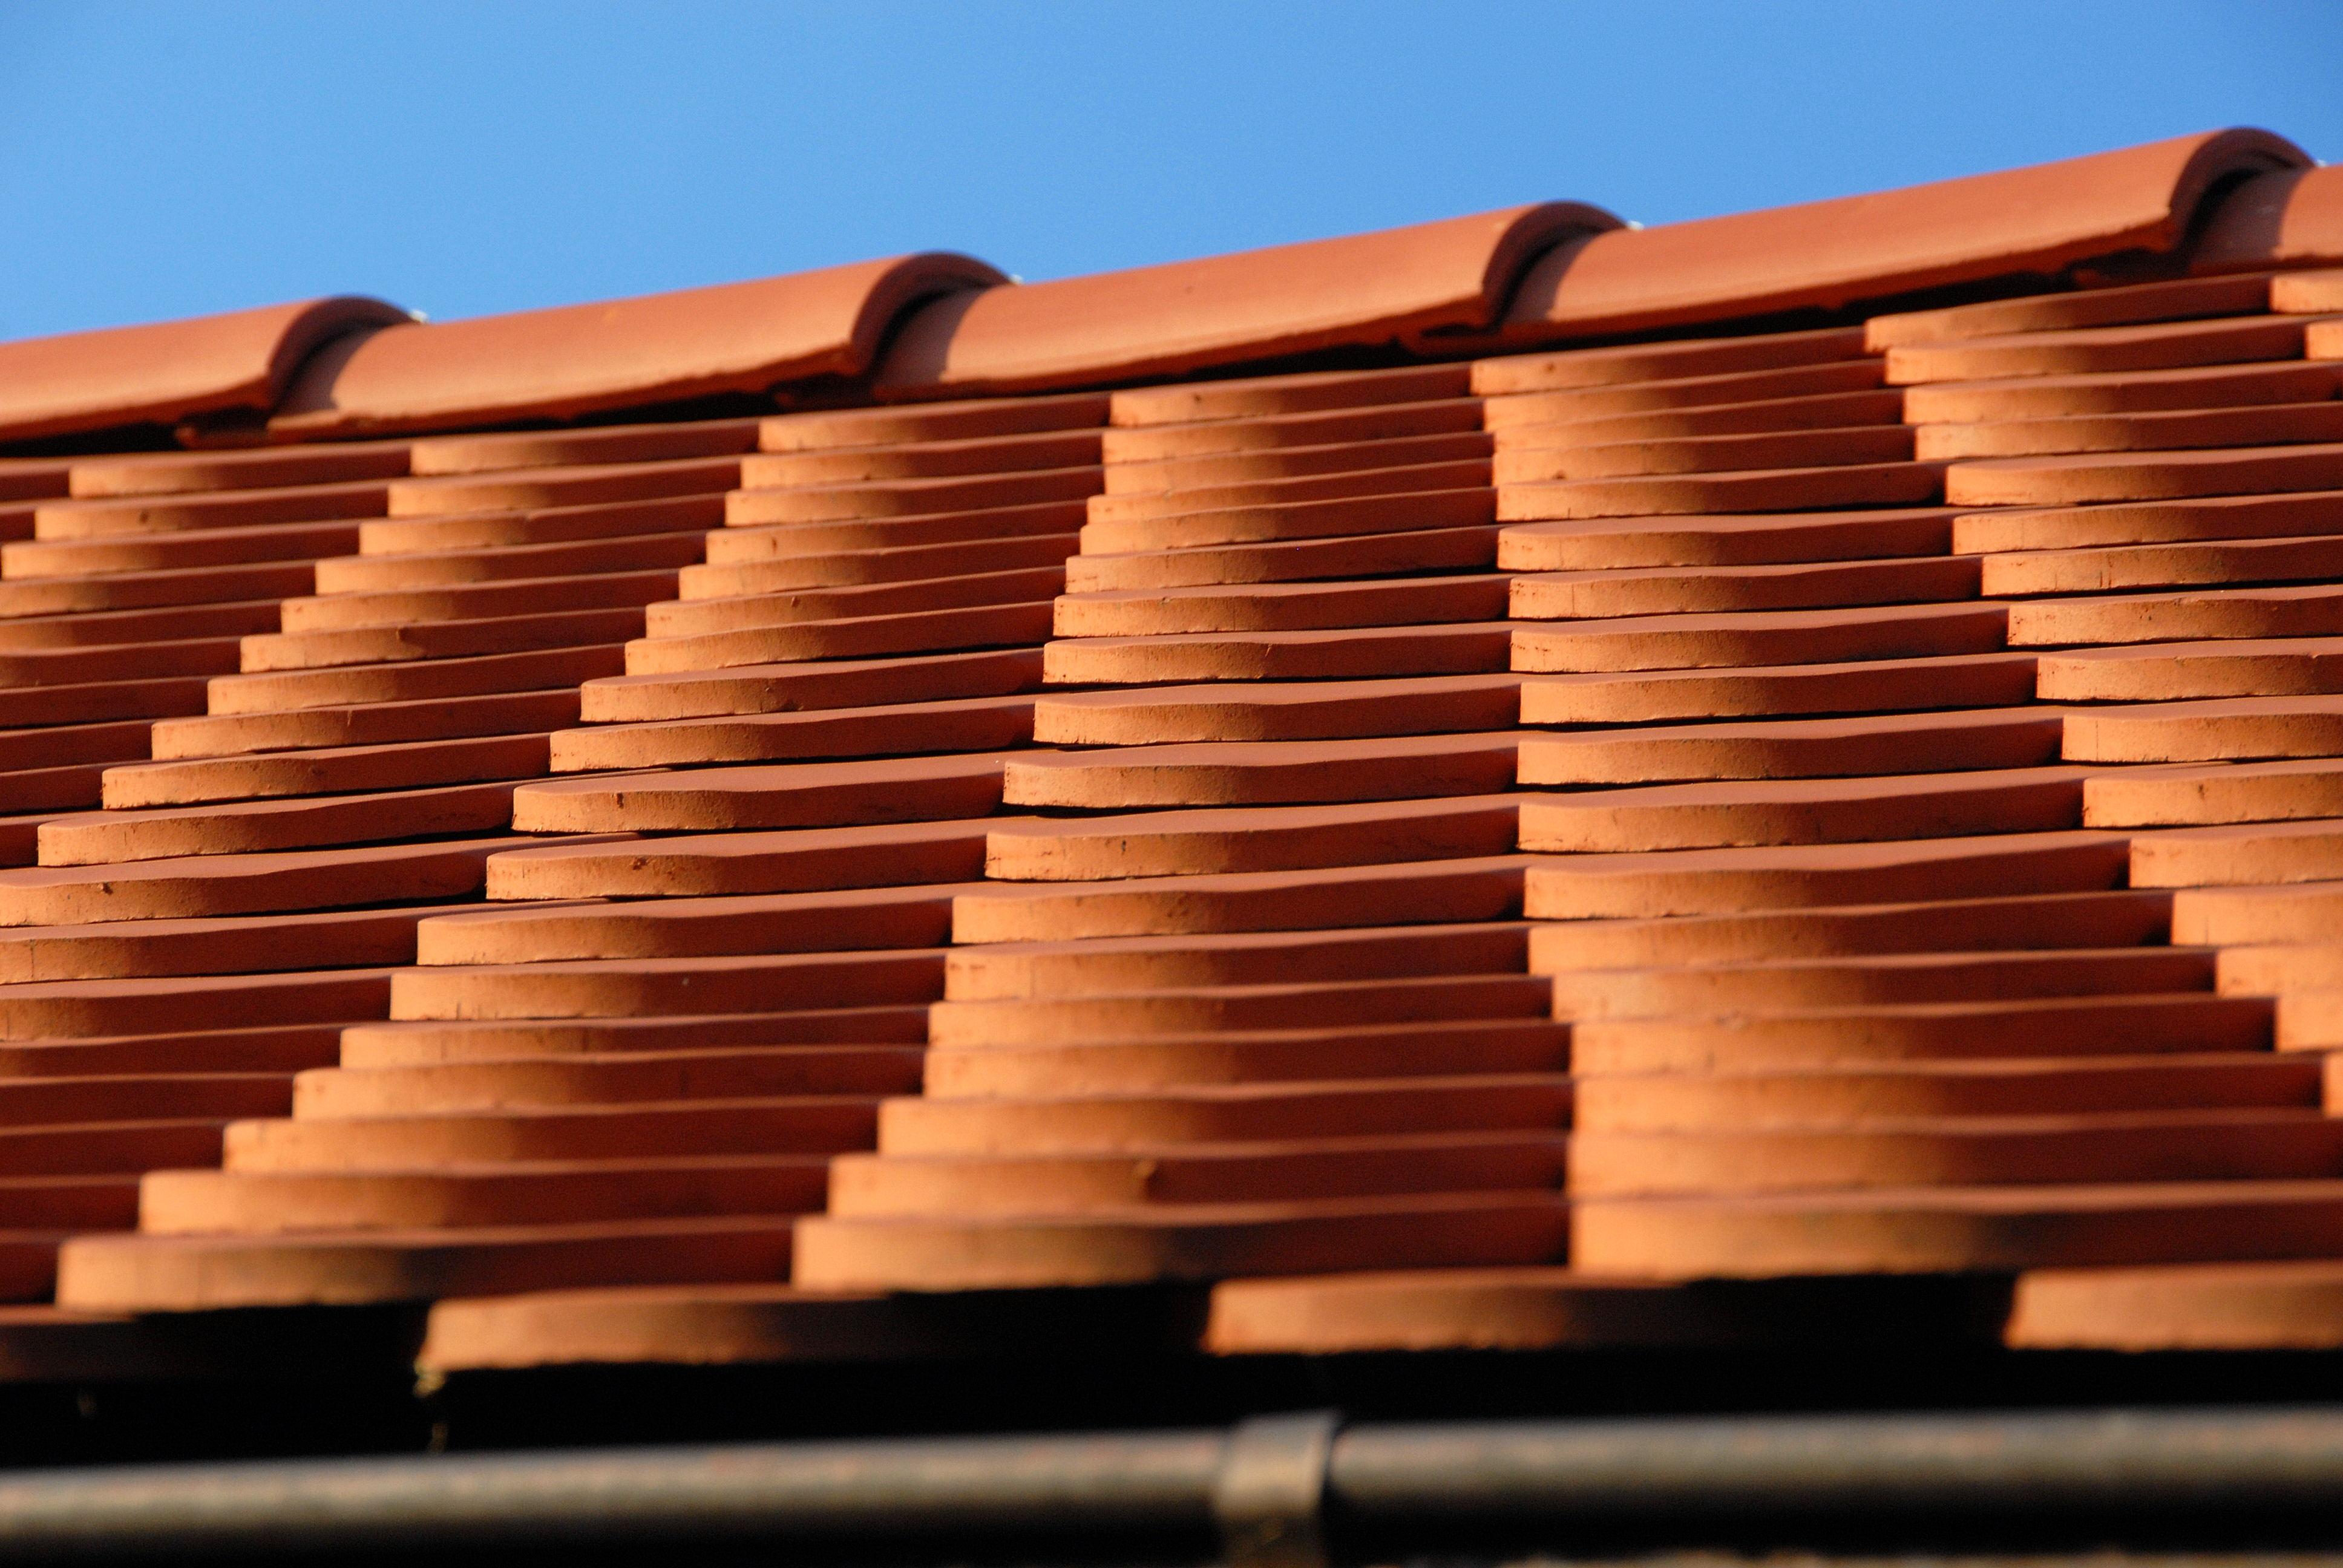 Rote Dachziegel dachpfanne